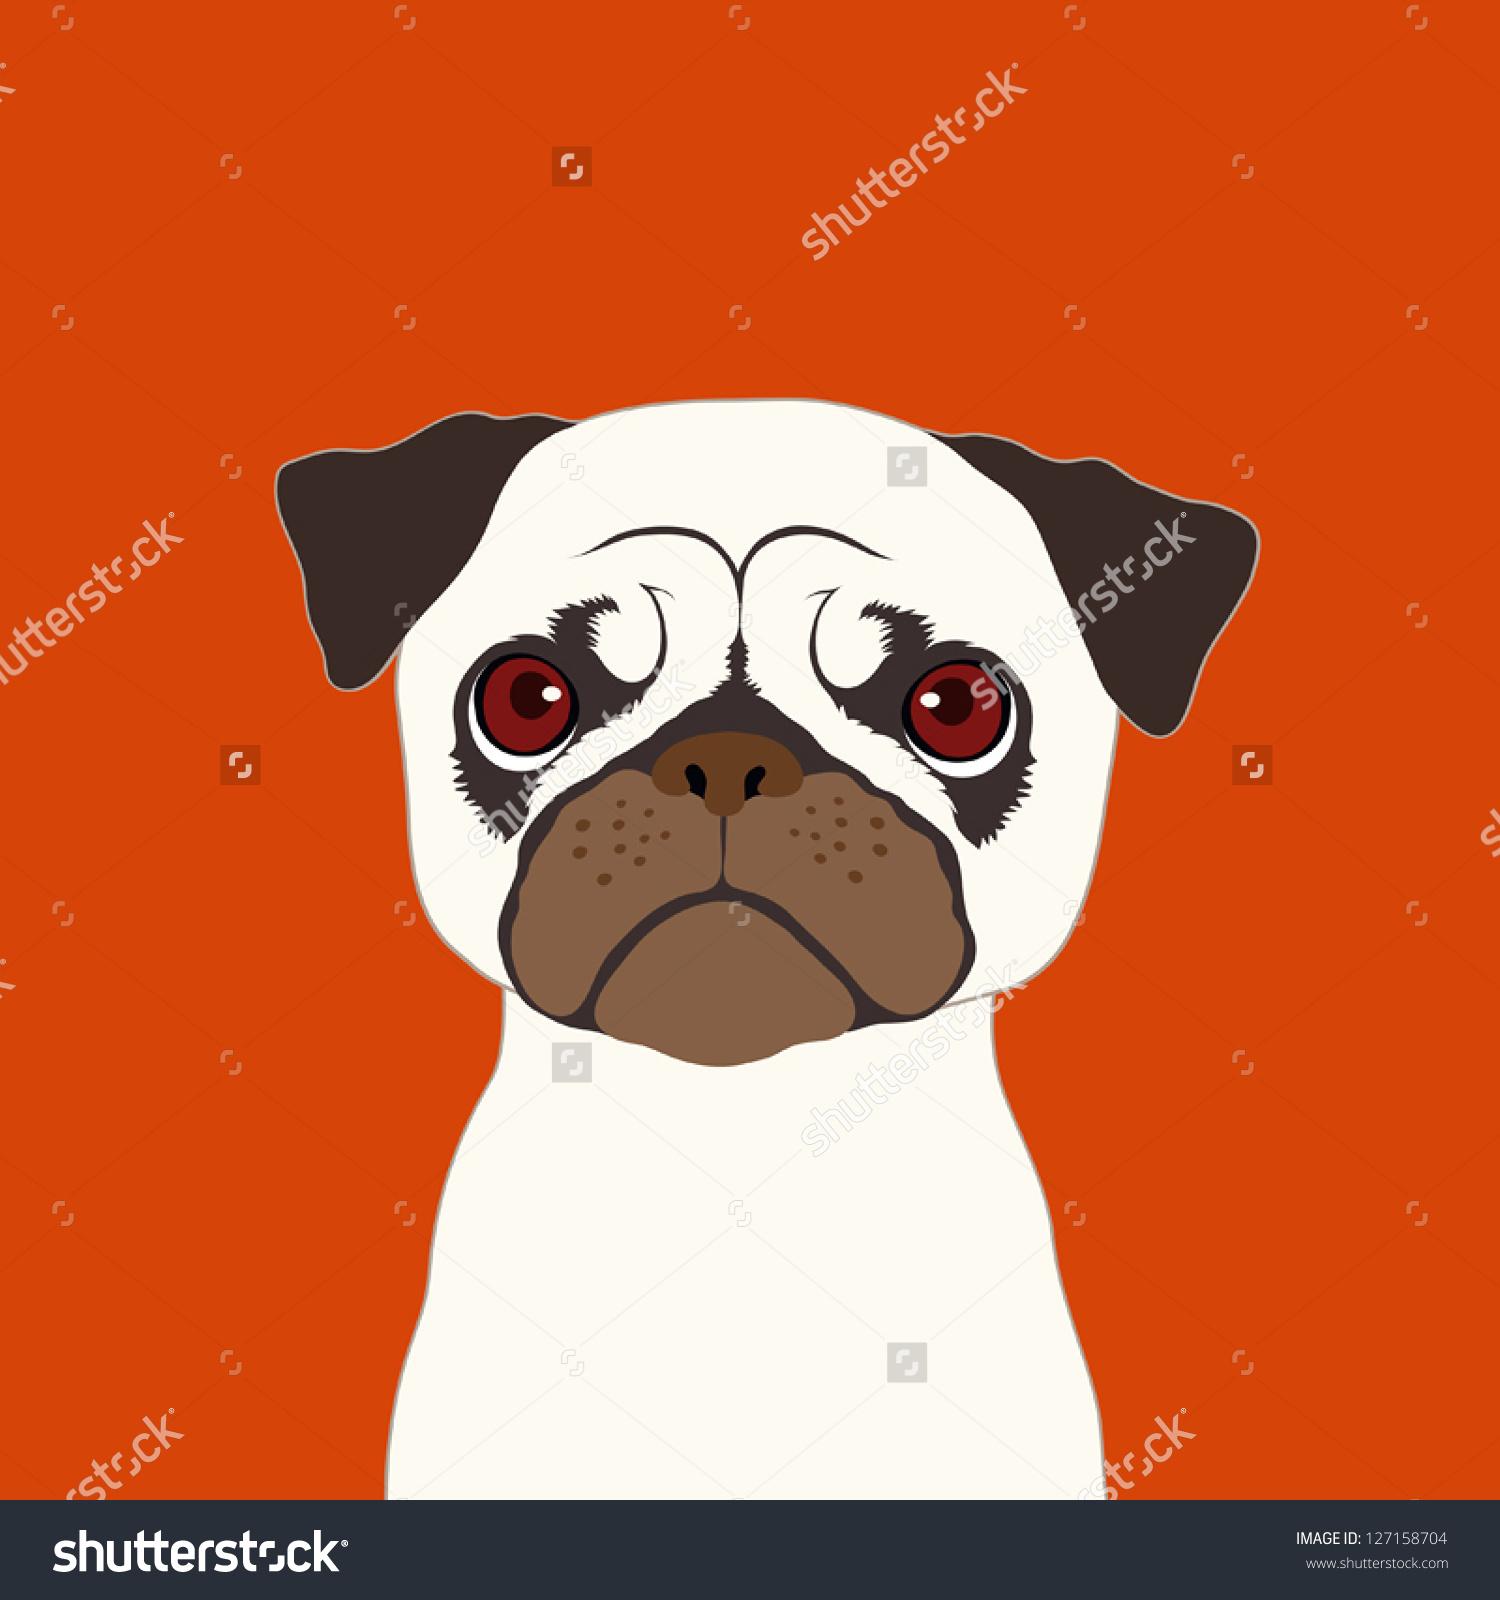 Buddy the dog clipart. Pug stock vector illustration